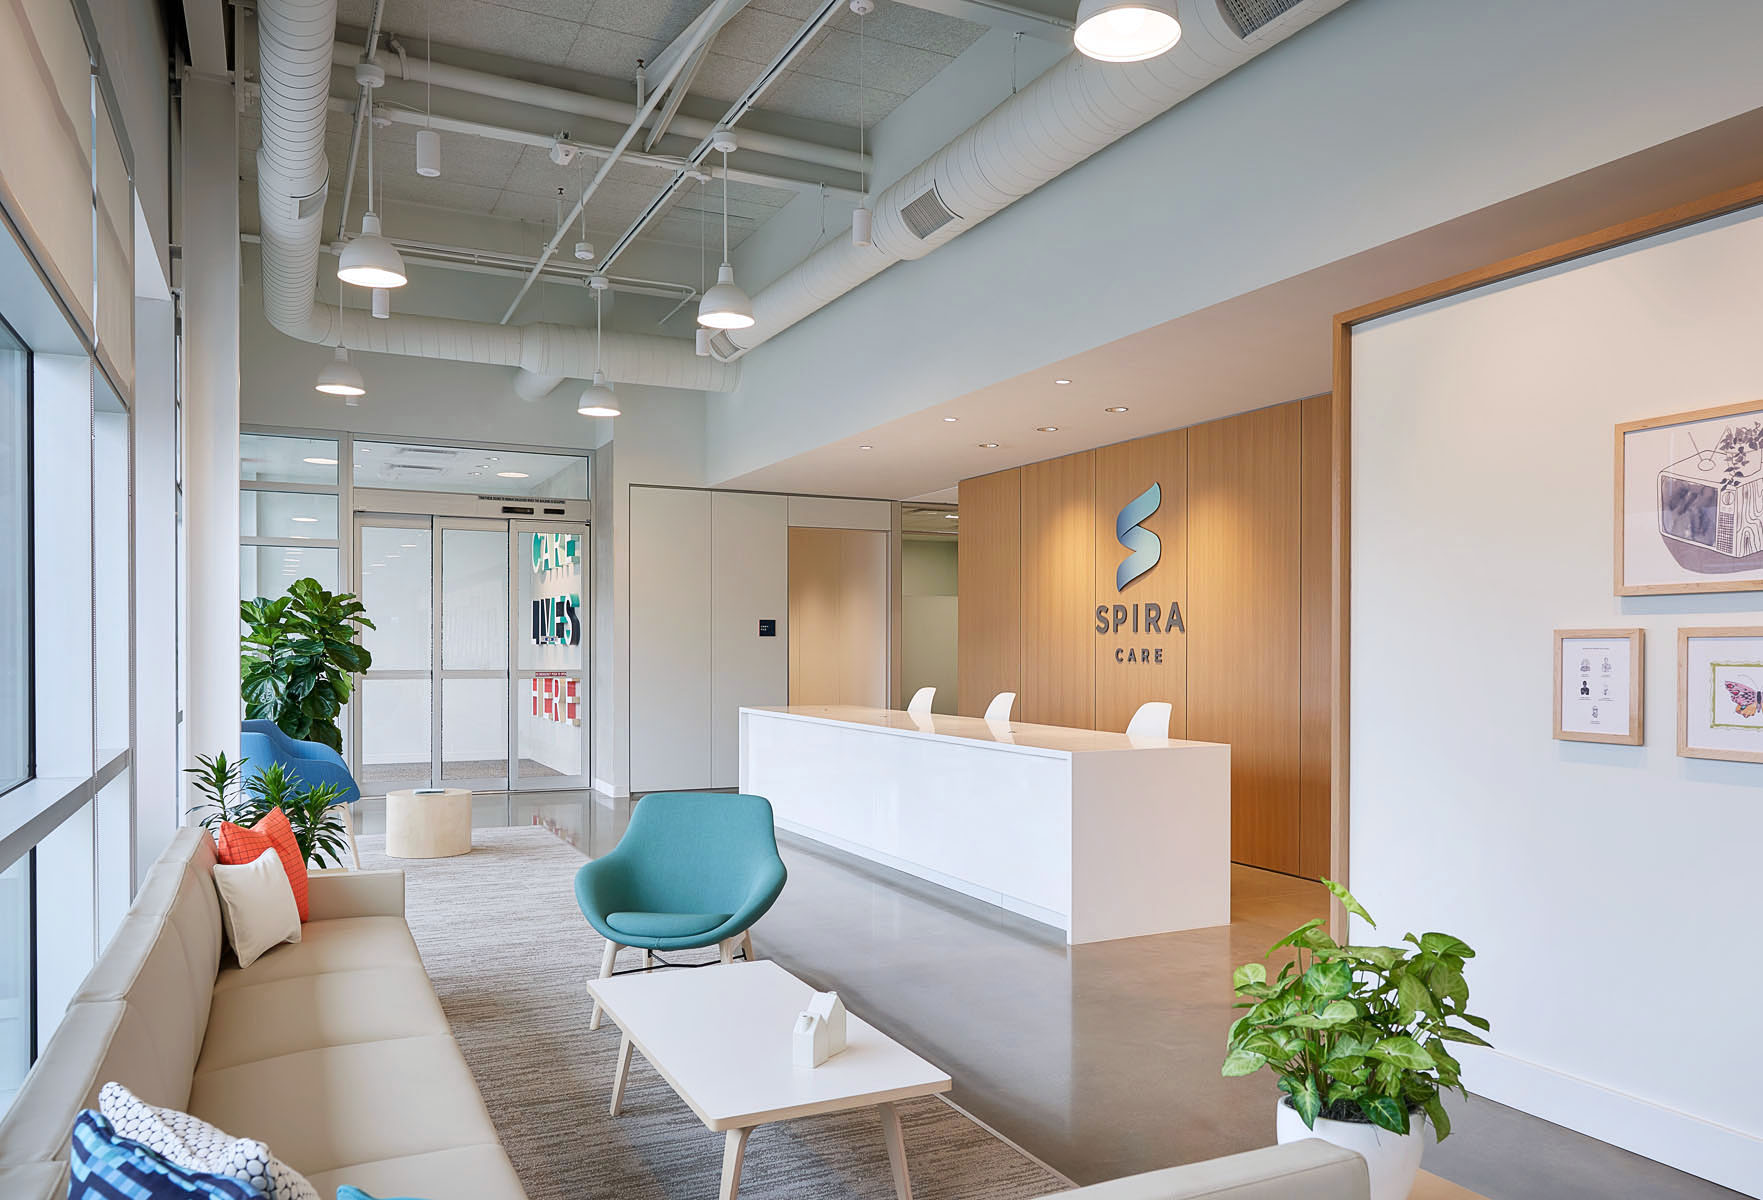 Spira Care Outpatient Clinics 9